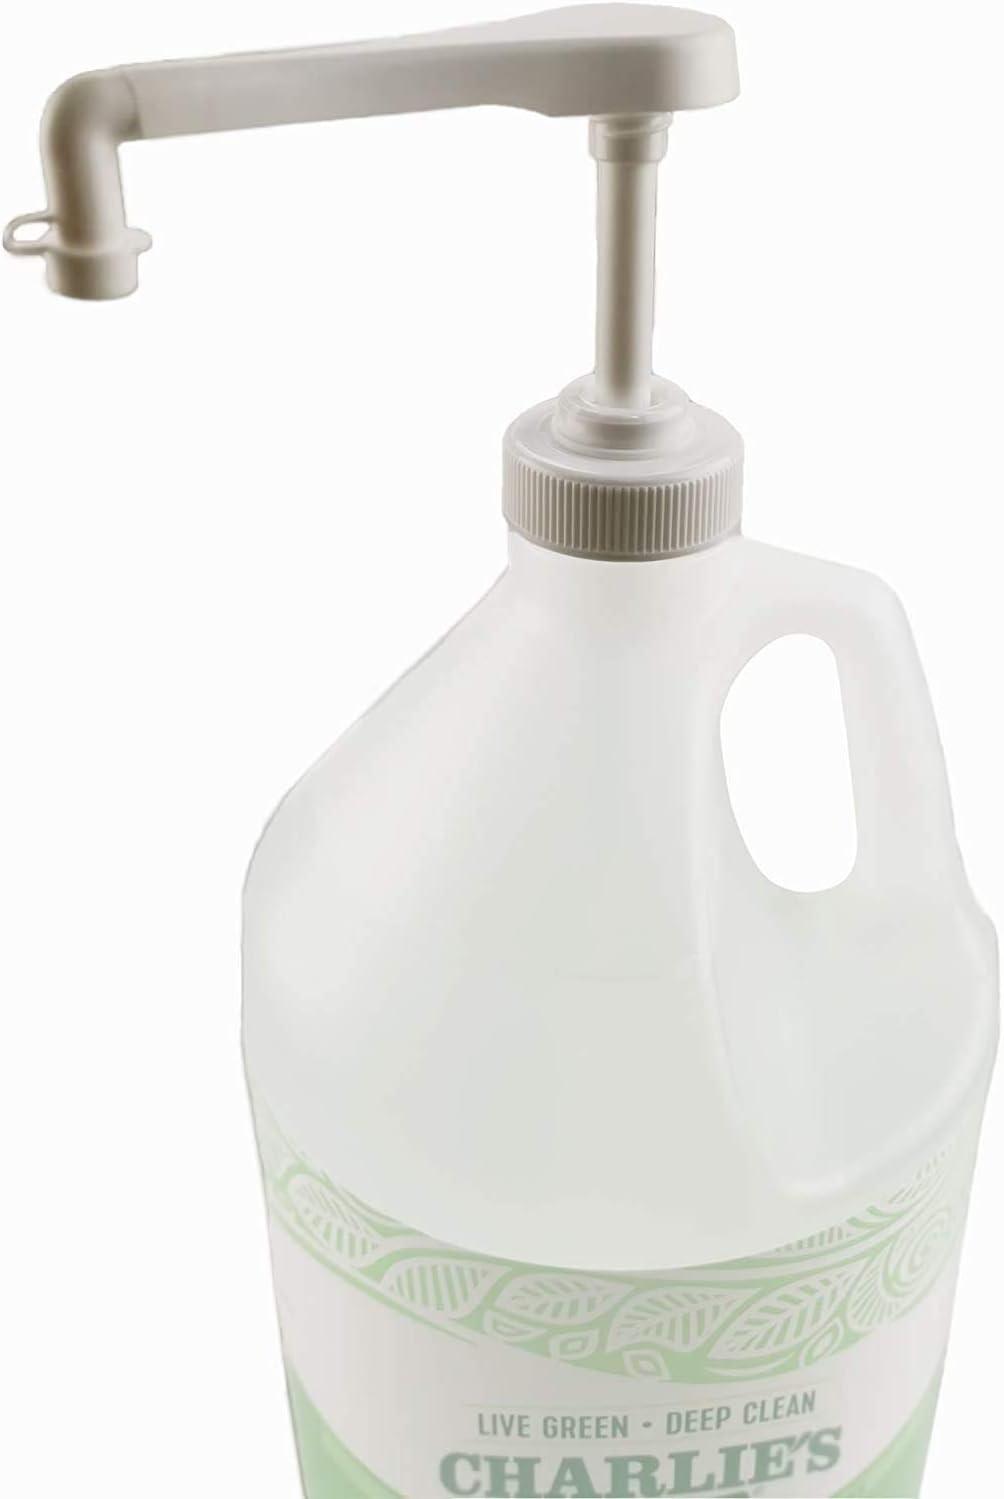 eBun Gallon Pump Bottle Dispenser (38/400, 1/4 Oz Output) Pump Fits Gallon Jug Hand Sanitizer Bulk Laundry Liquid Soap Shampoo Conditioner Massage Lotion Popcorn Oil Half Gallon Container